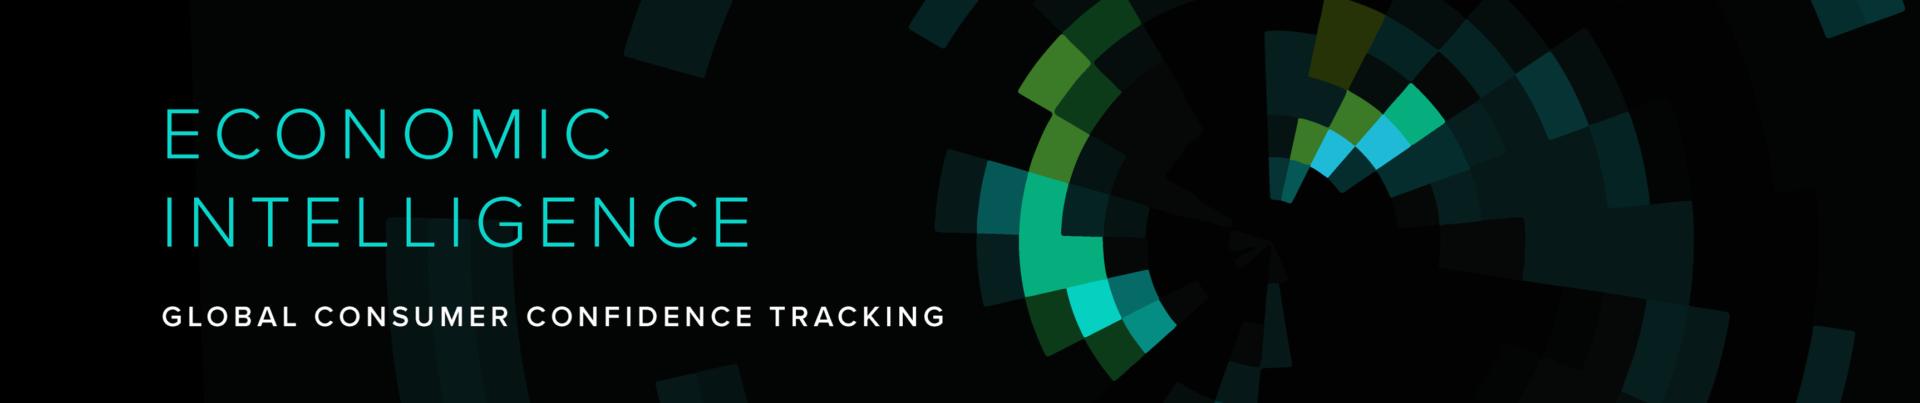 Morning Consult Economic Intelligence; Global Consumer Confidence Tracking